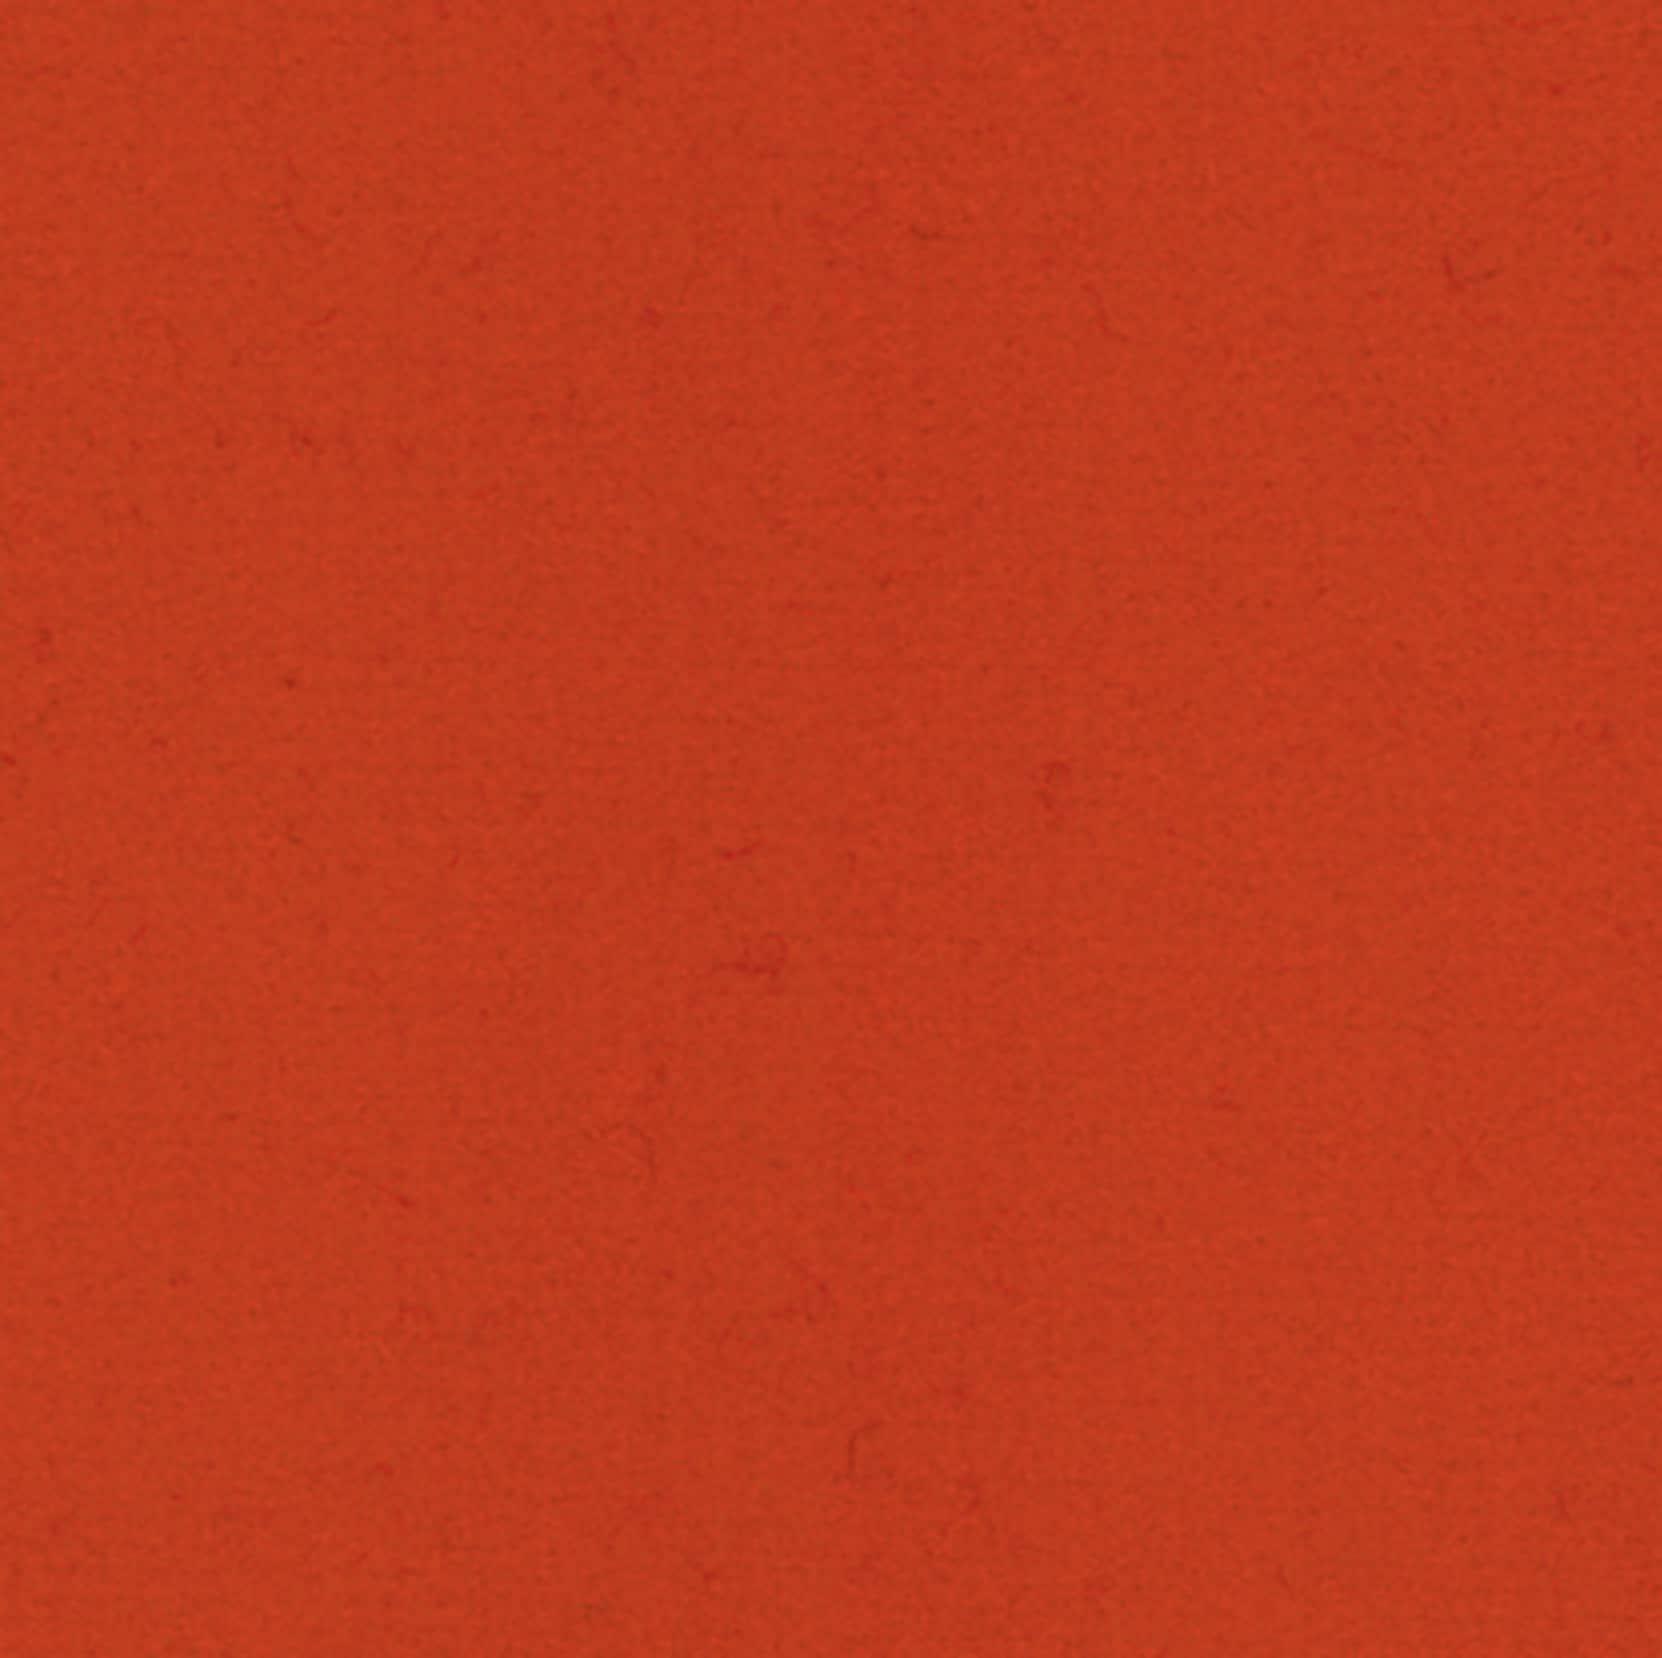 Orange CUZ39 1 7